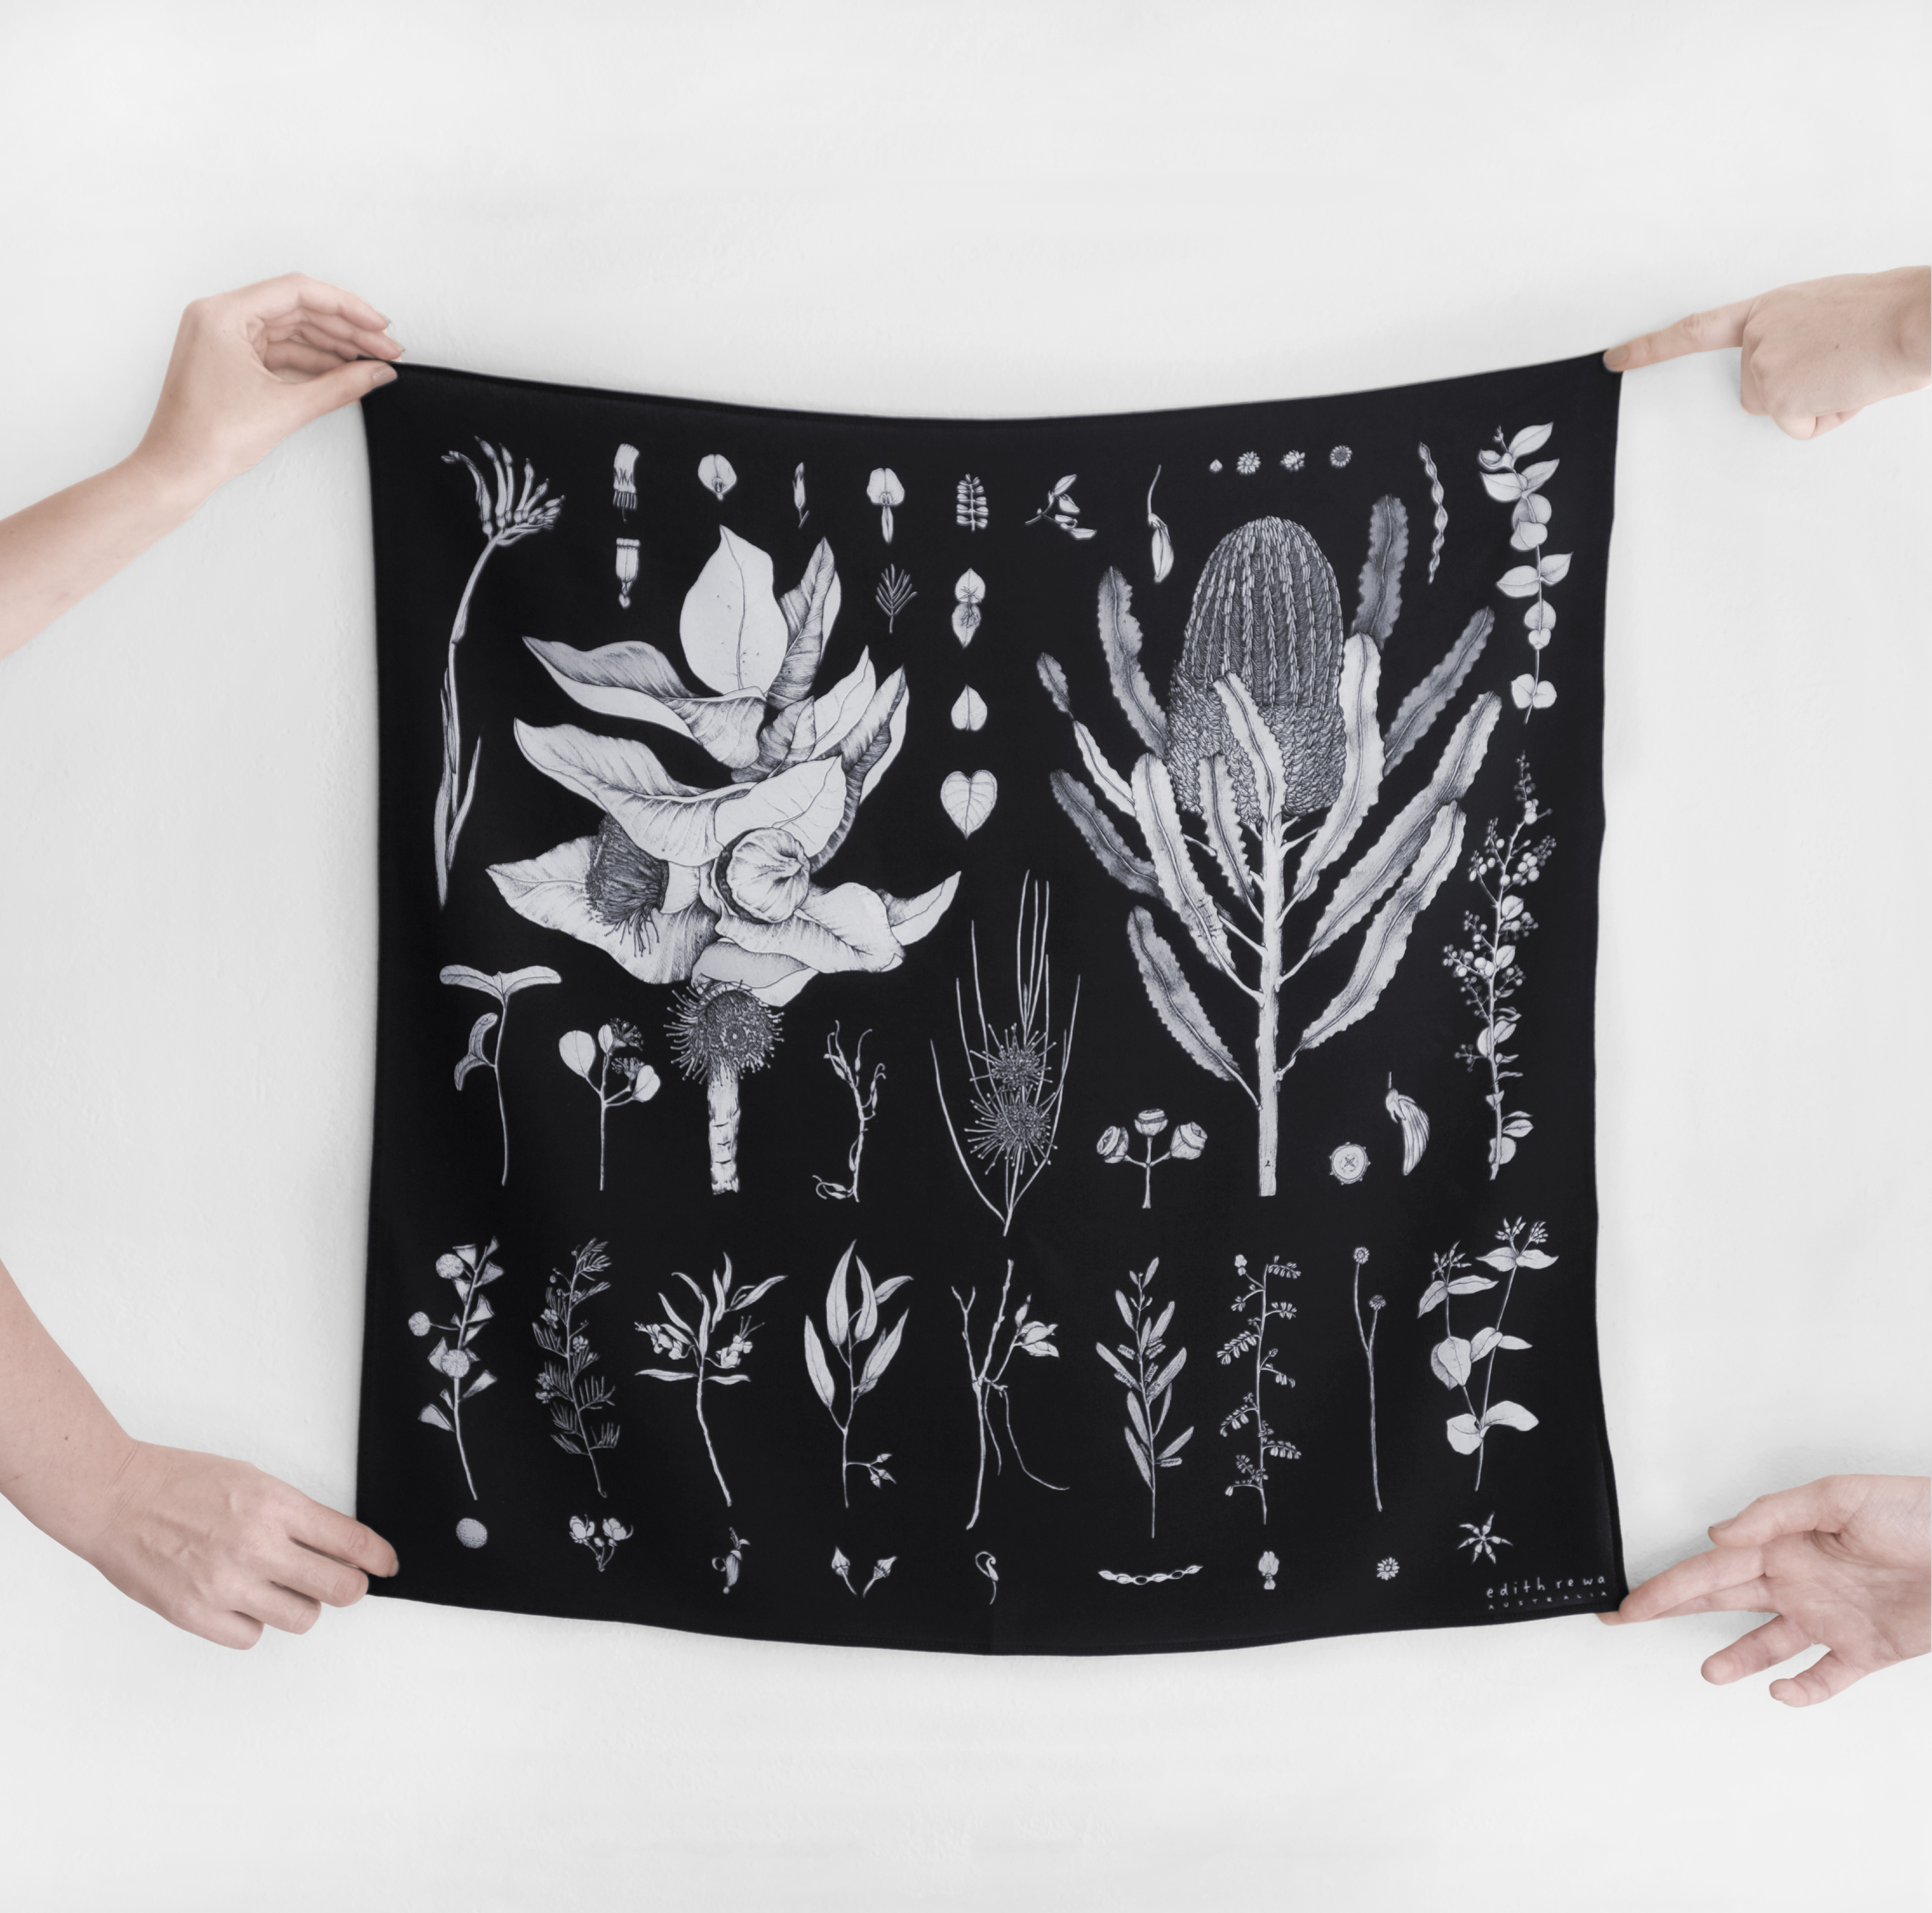 Categories: Fashion-Edith Rewa - Textile designer, Illustrator -  Issue 8